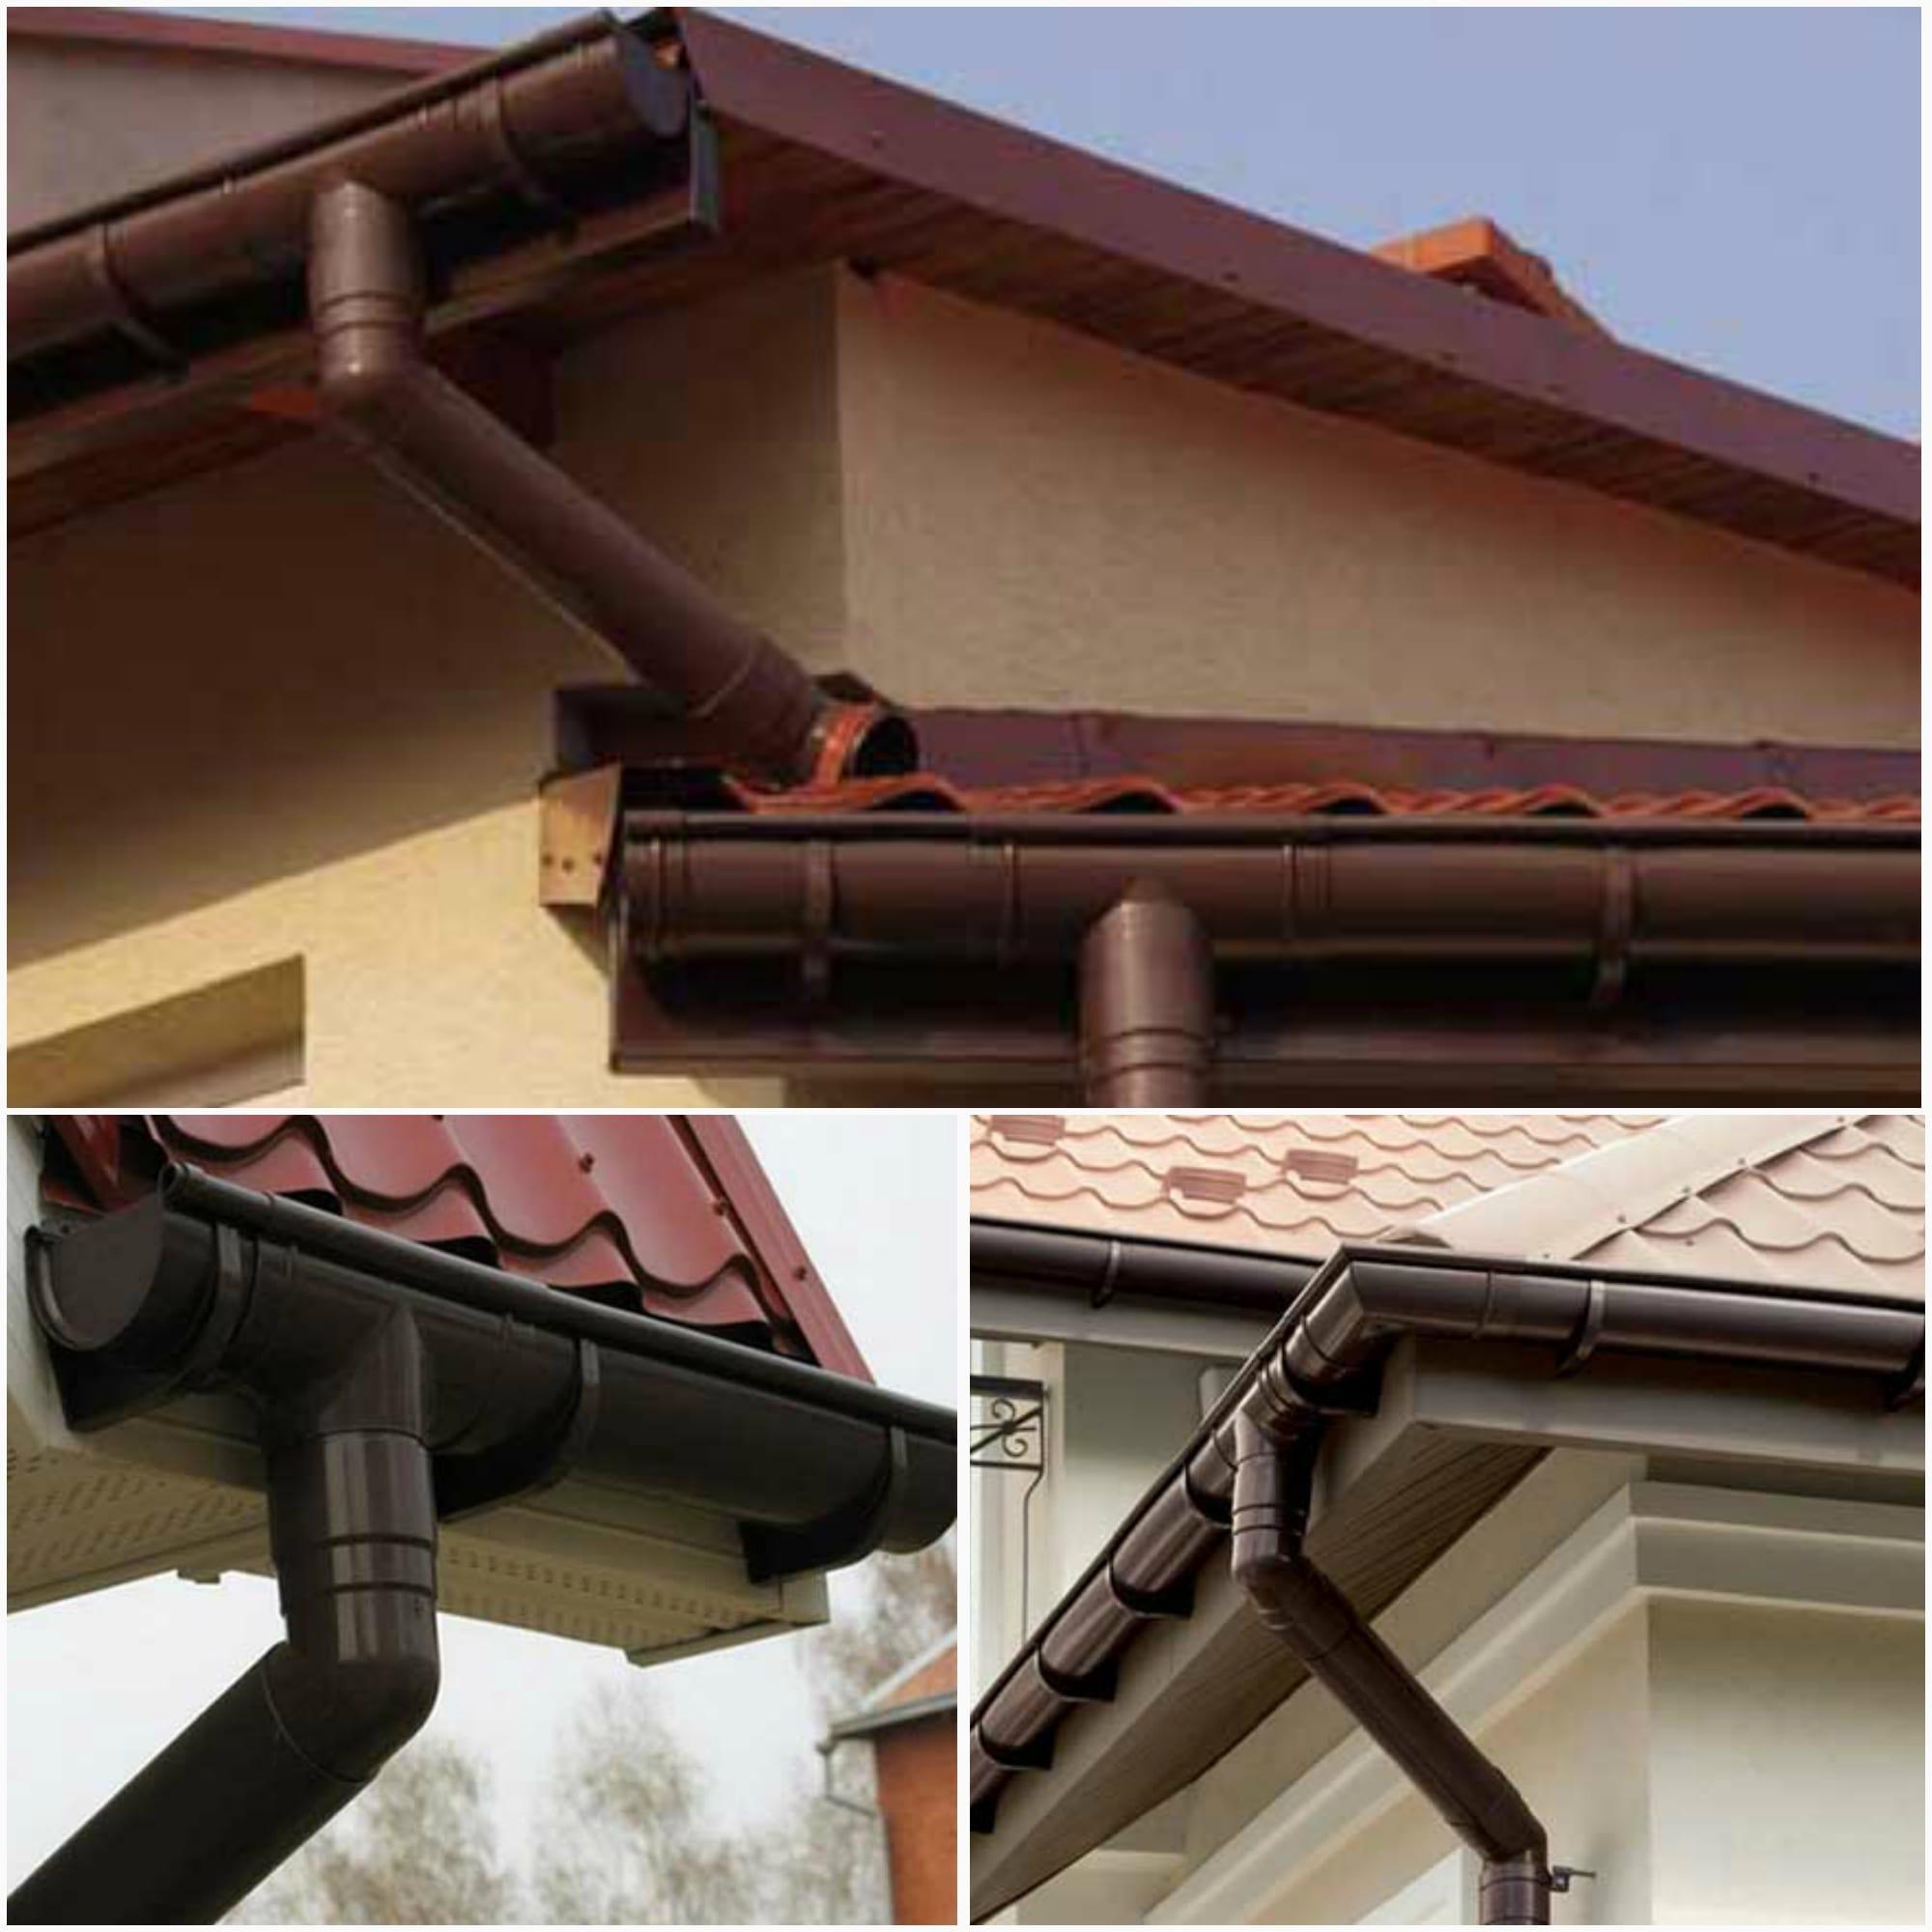 Сливная система крыши: материалы, монтаж 23